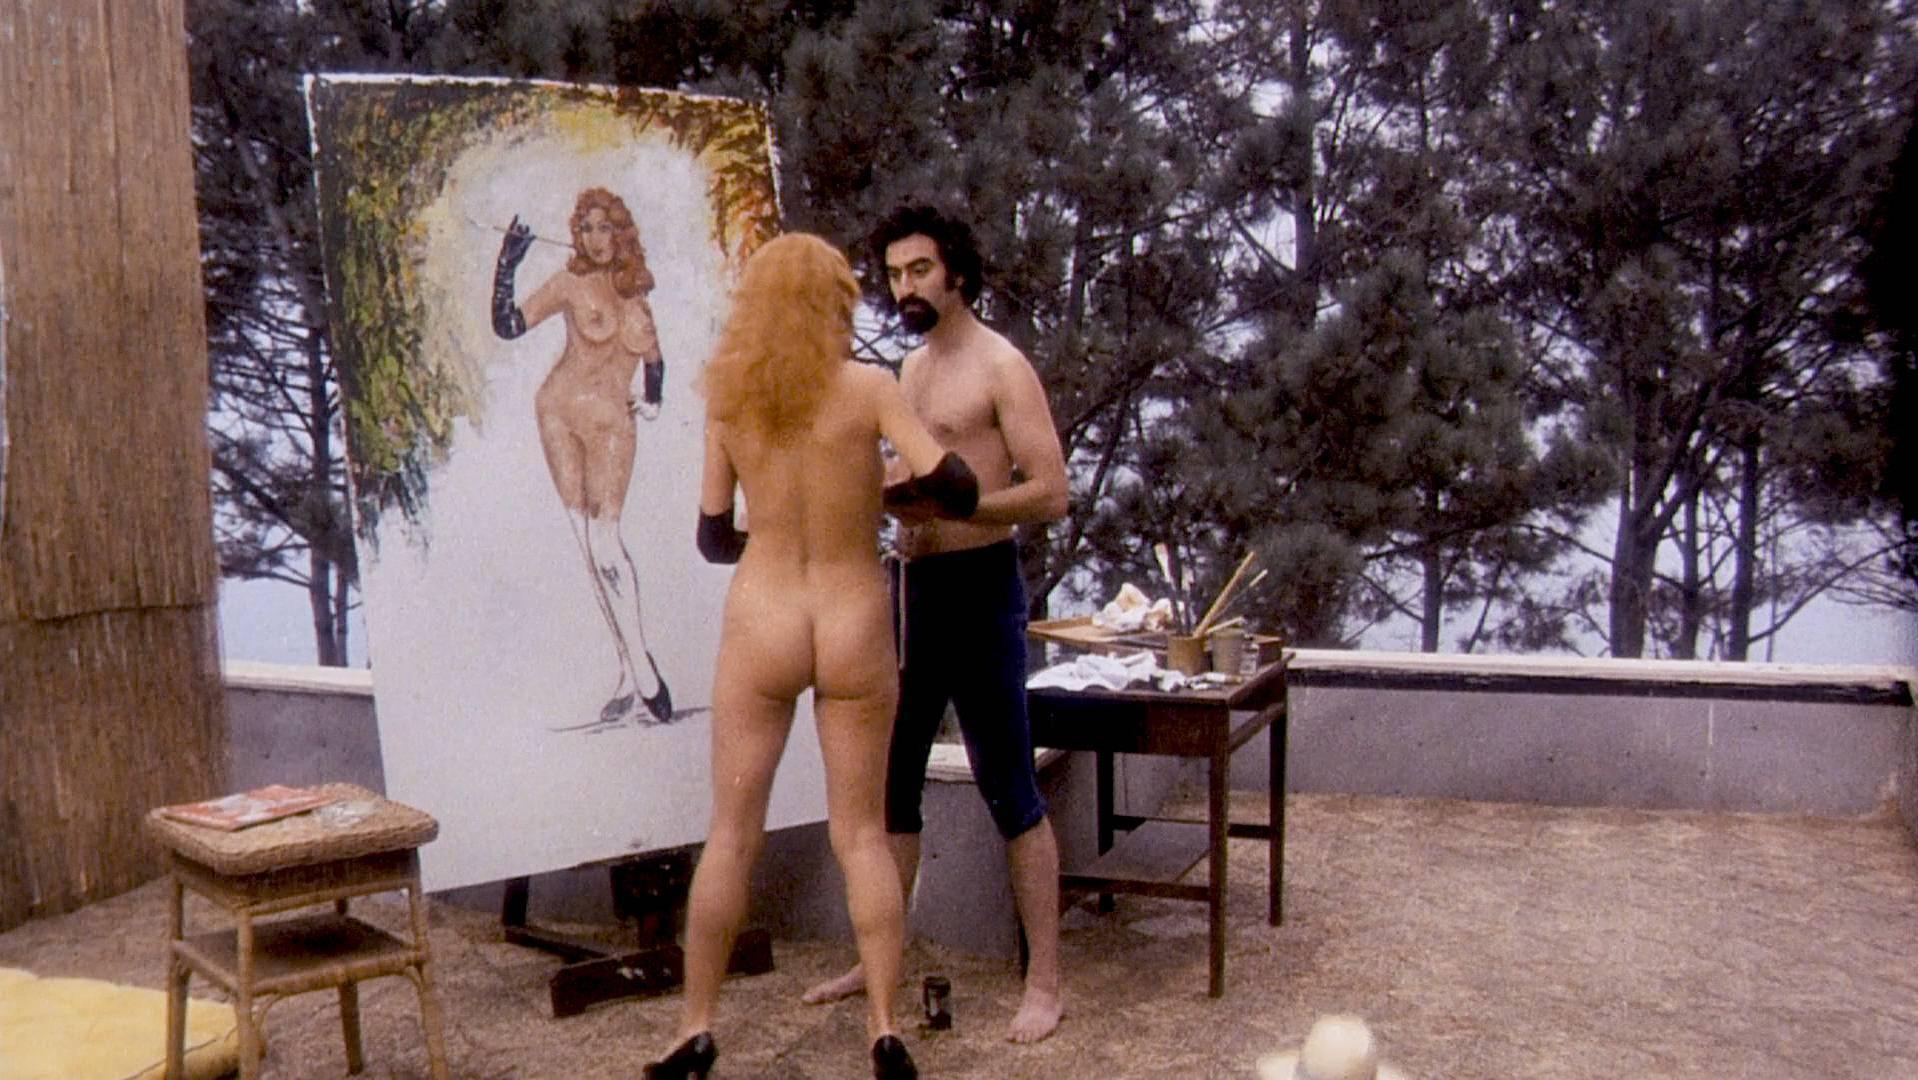 Angelique Pettyjohn Topless nude video celebs � actress � angelique pettyjohn